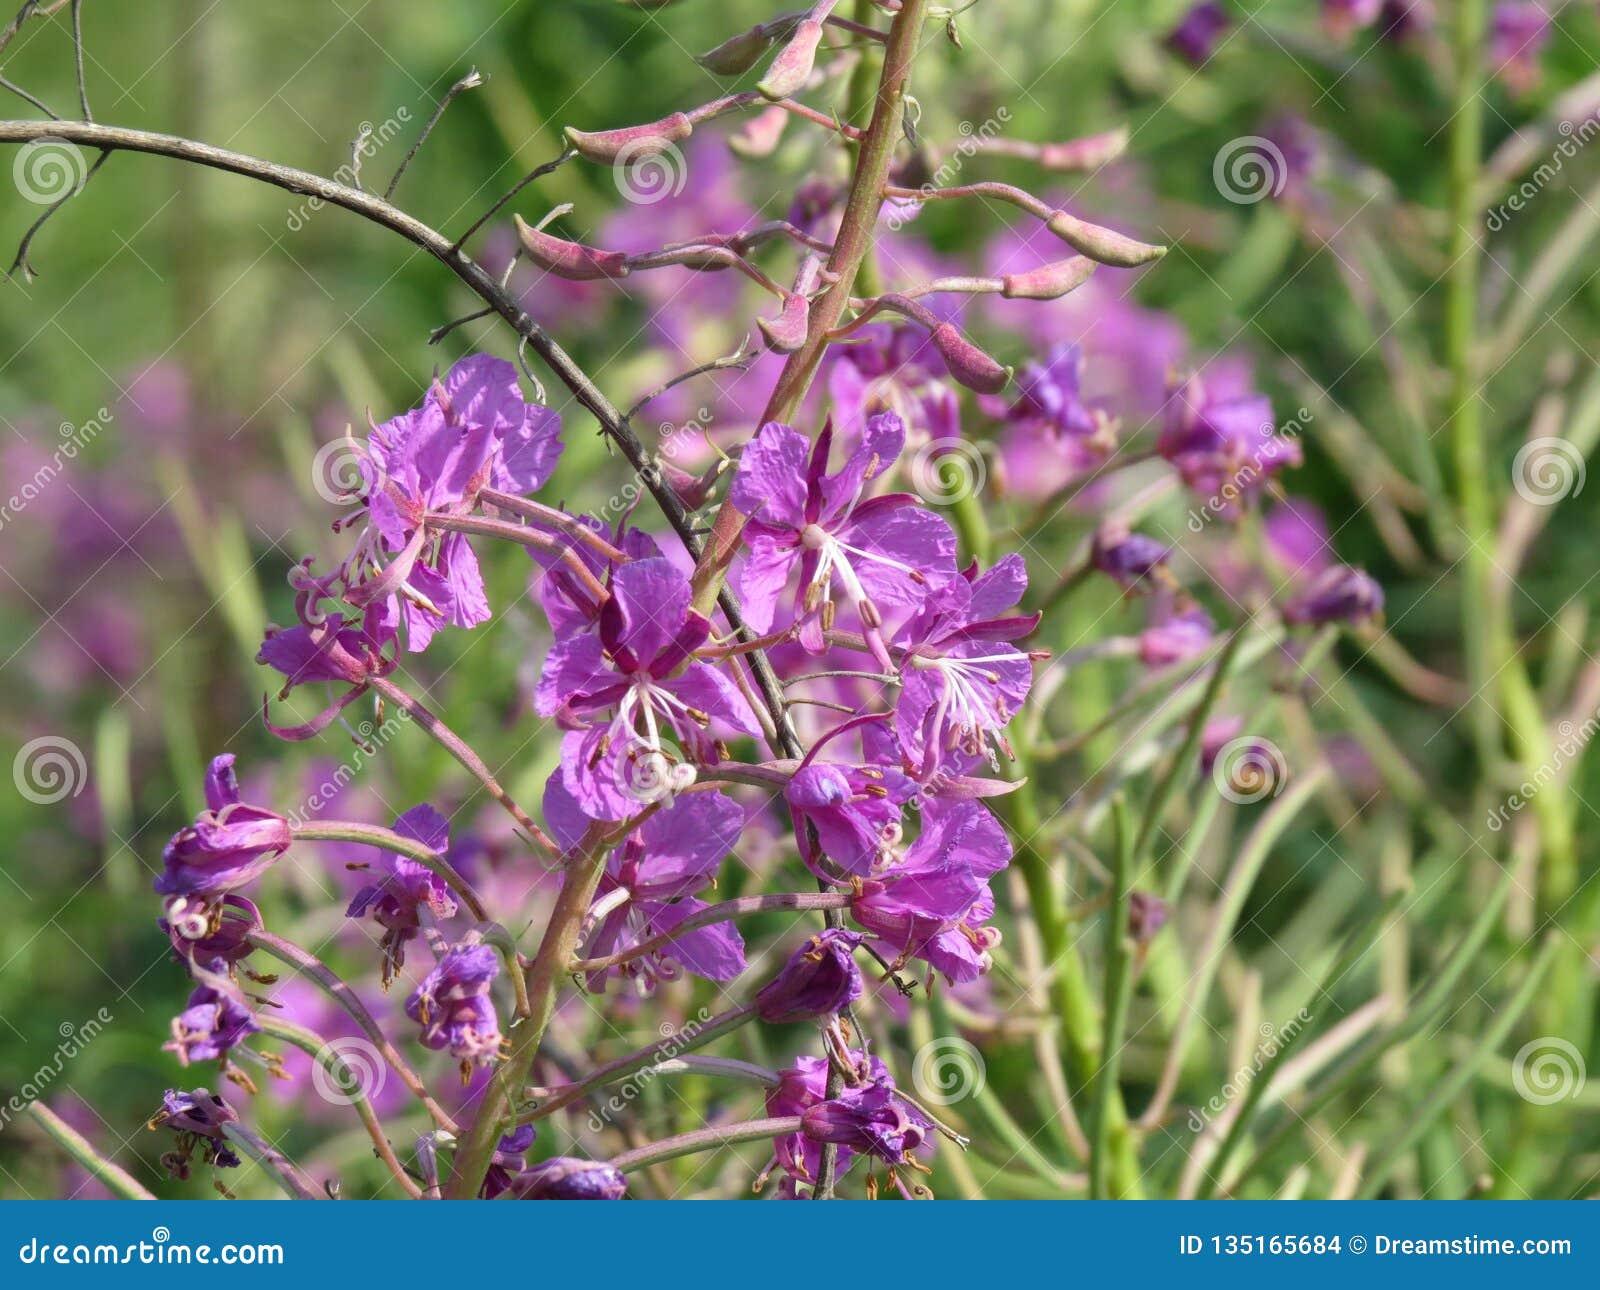 Rosebay柳草Chamerion angustifolium,也柳叶菜属angustifolium 野草从这棵植物离开能接受